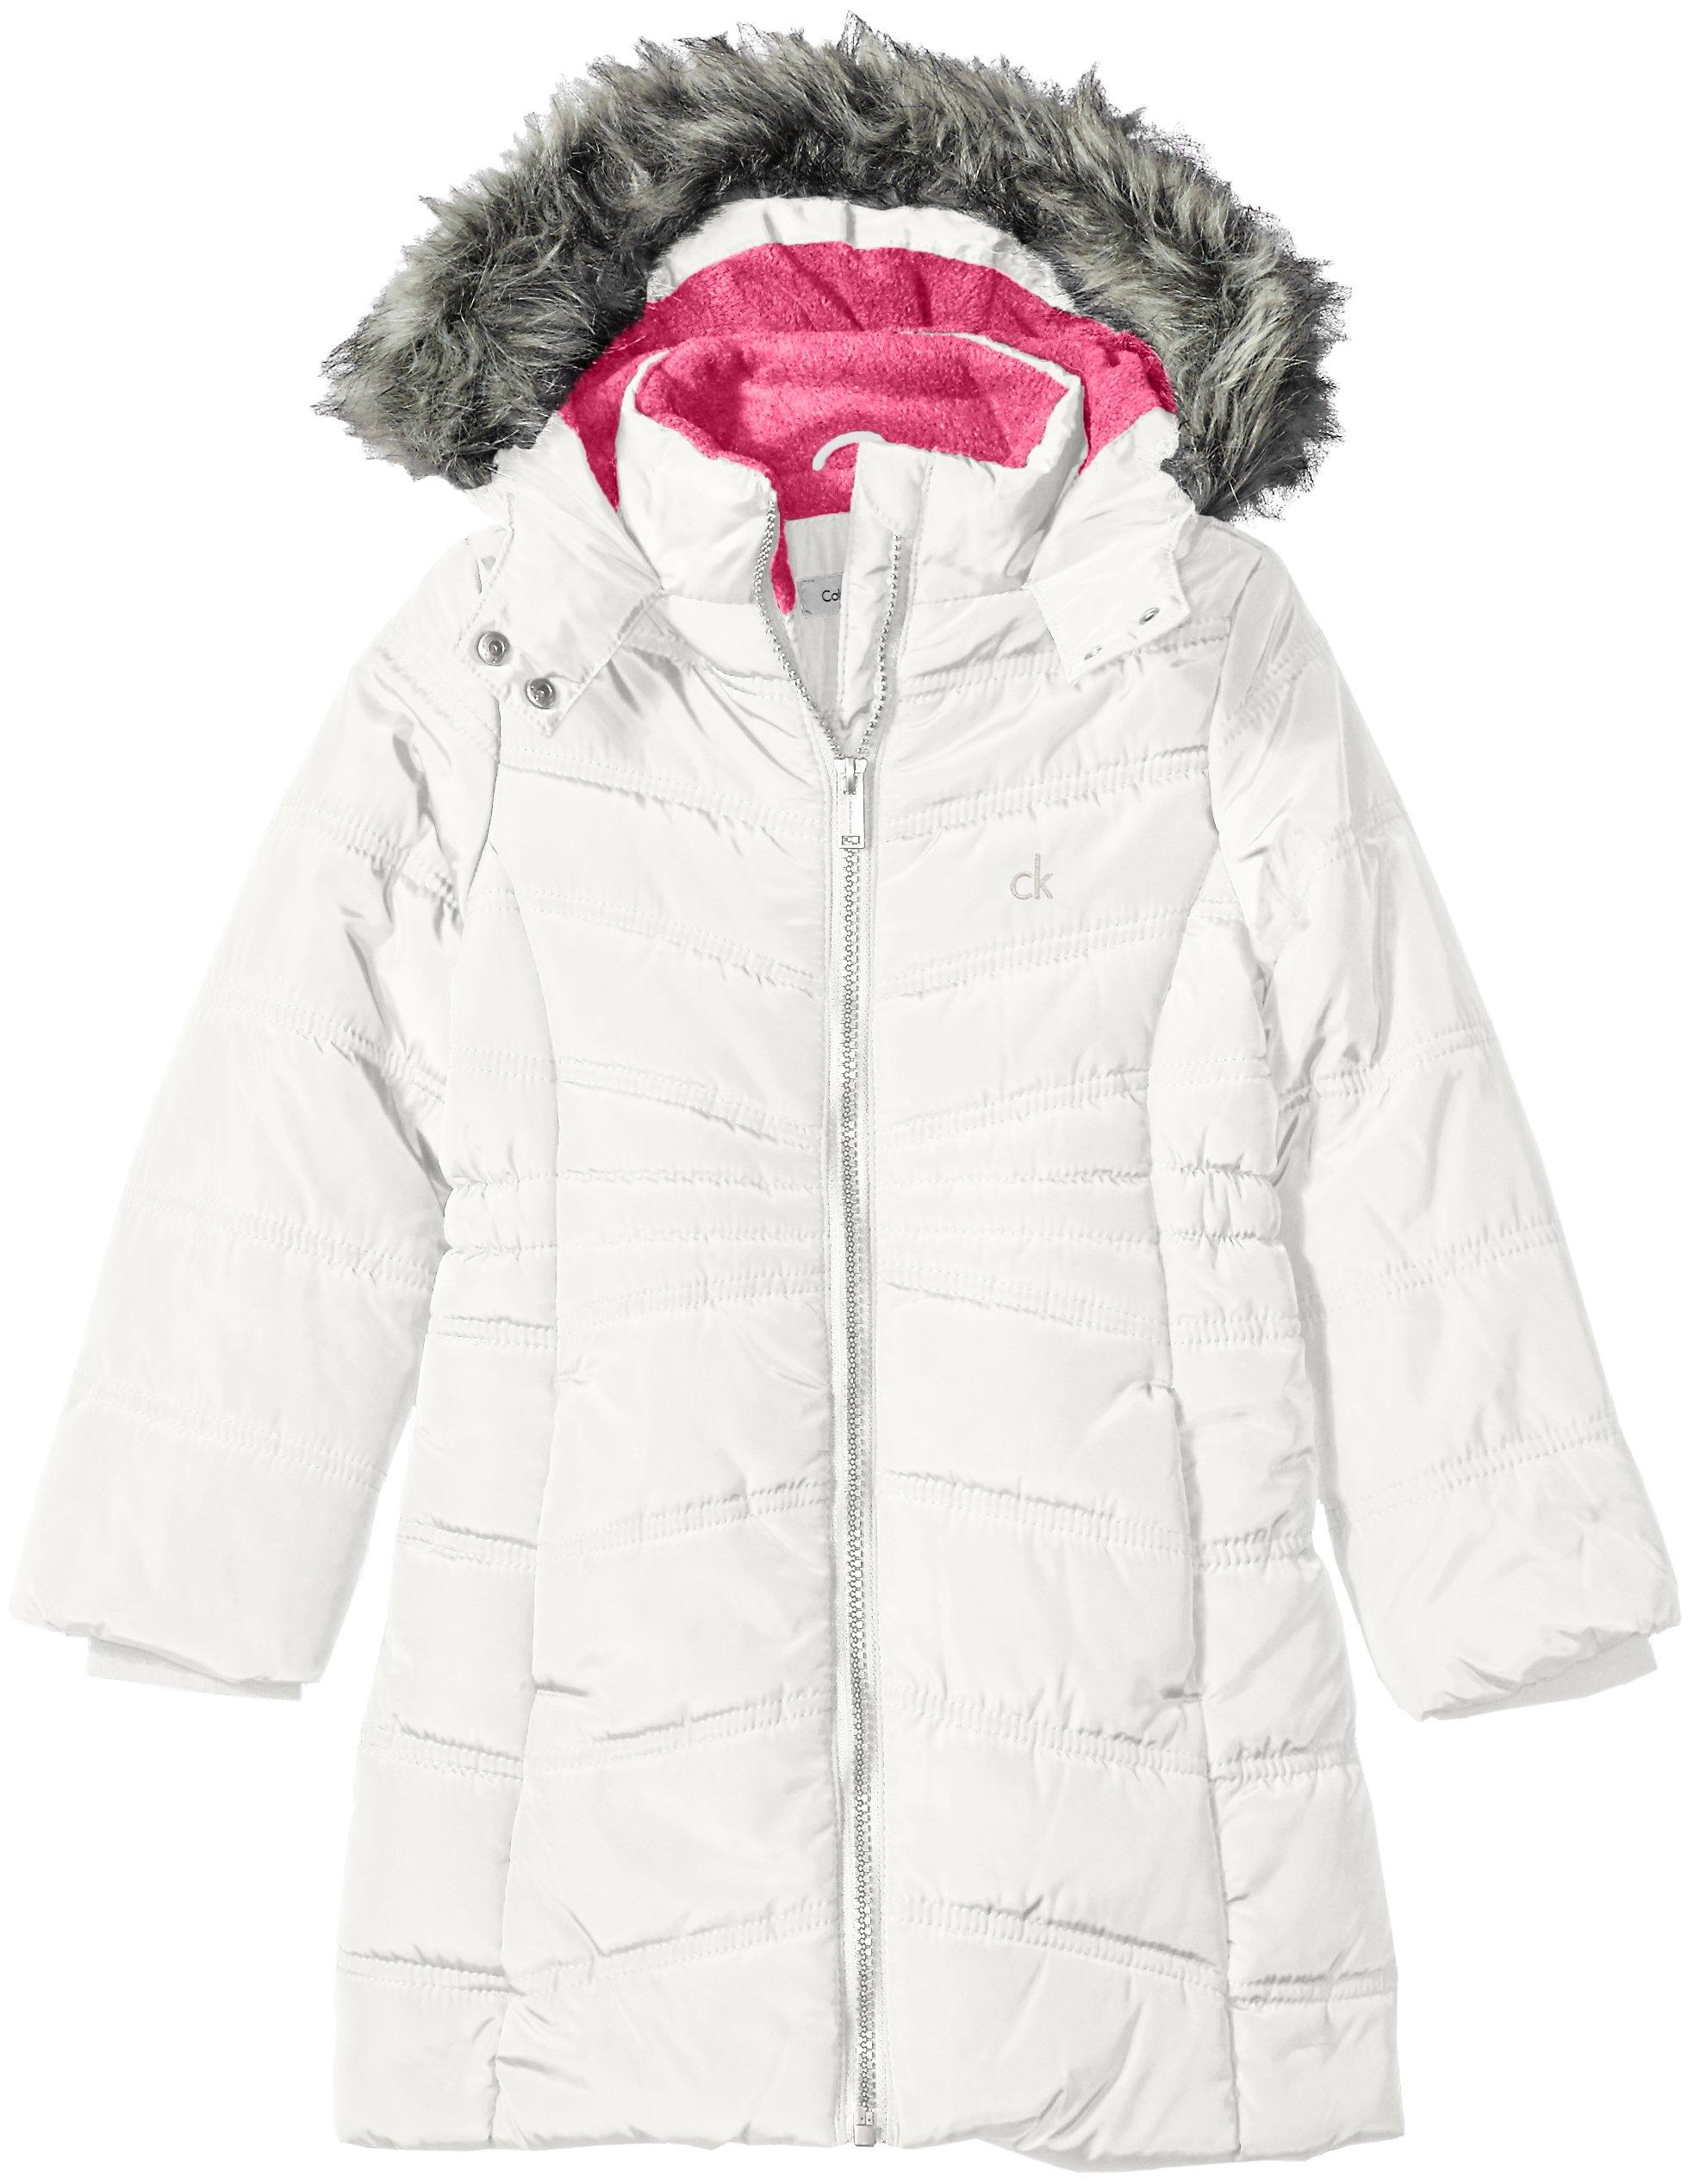 Calvin Klein Little Girls' Long Puffer Jacket, Off White, 5